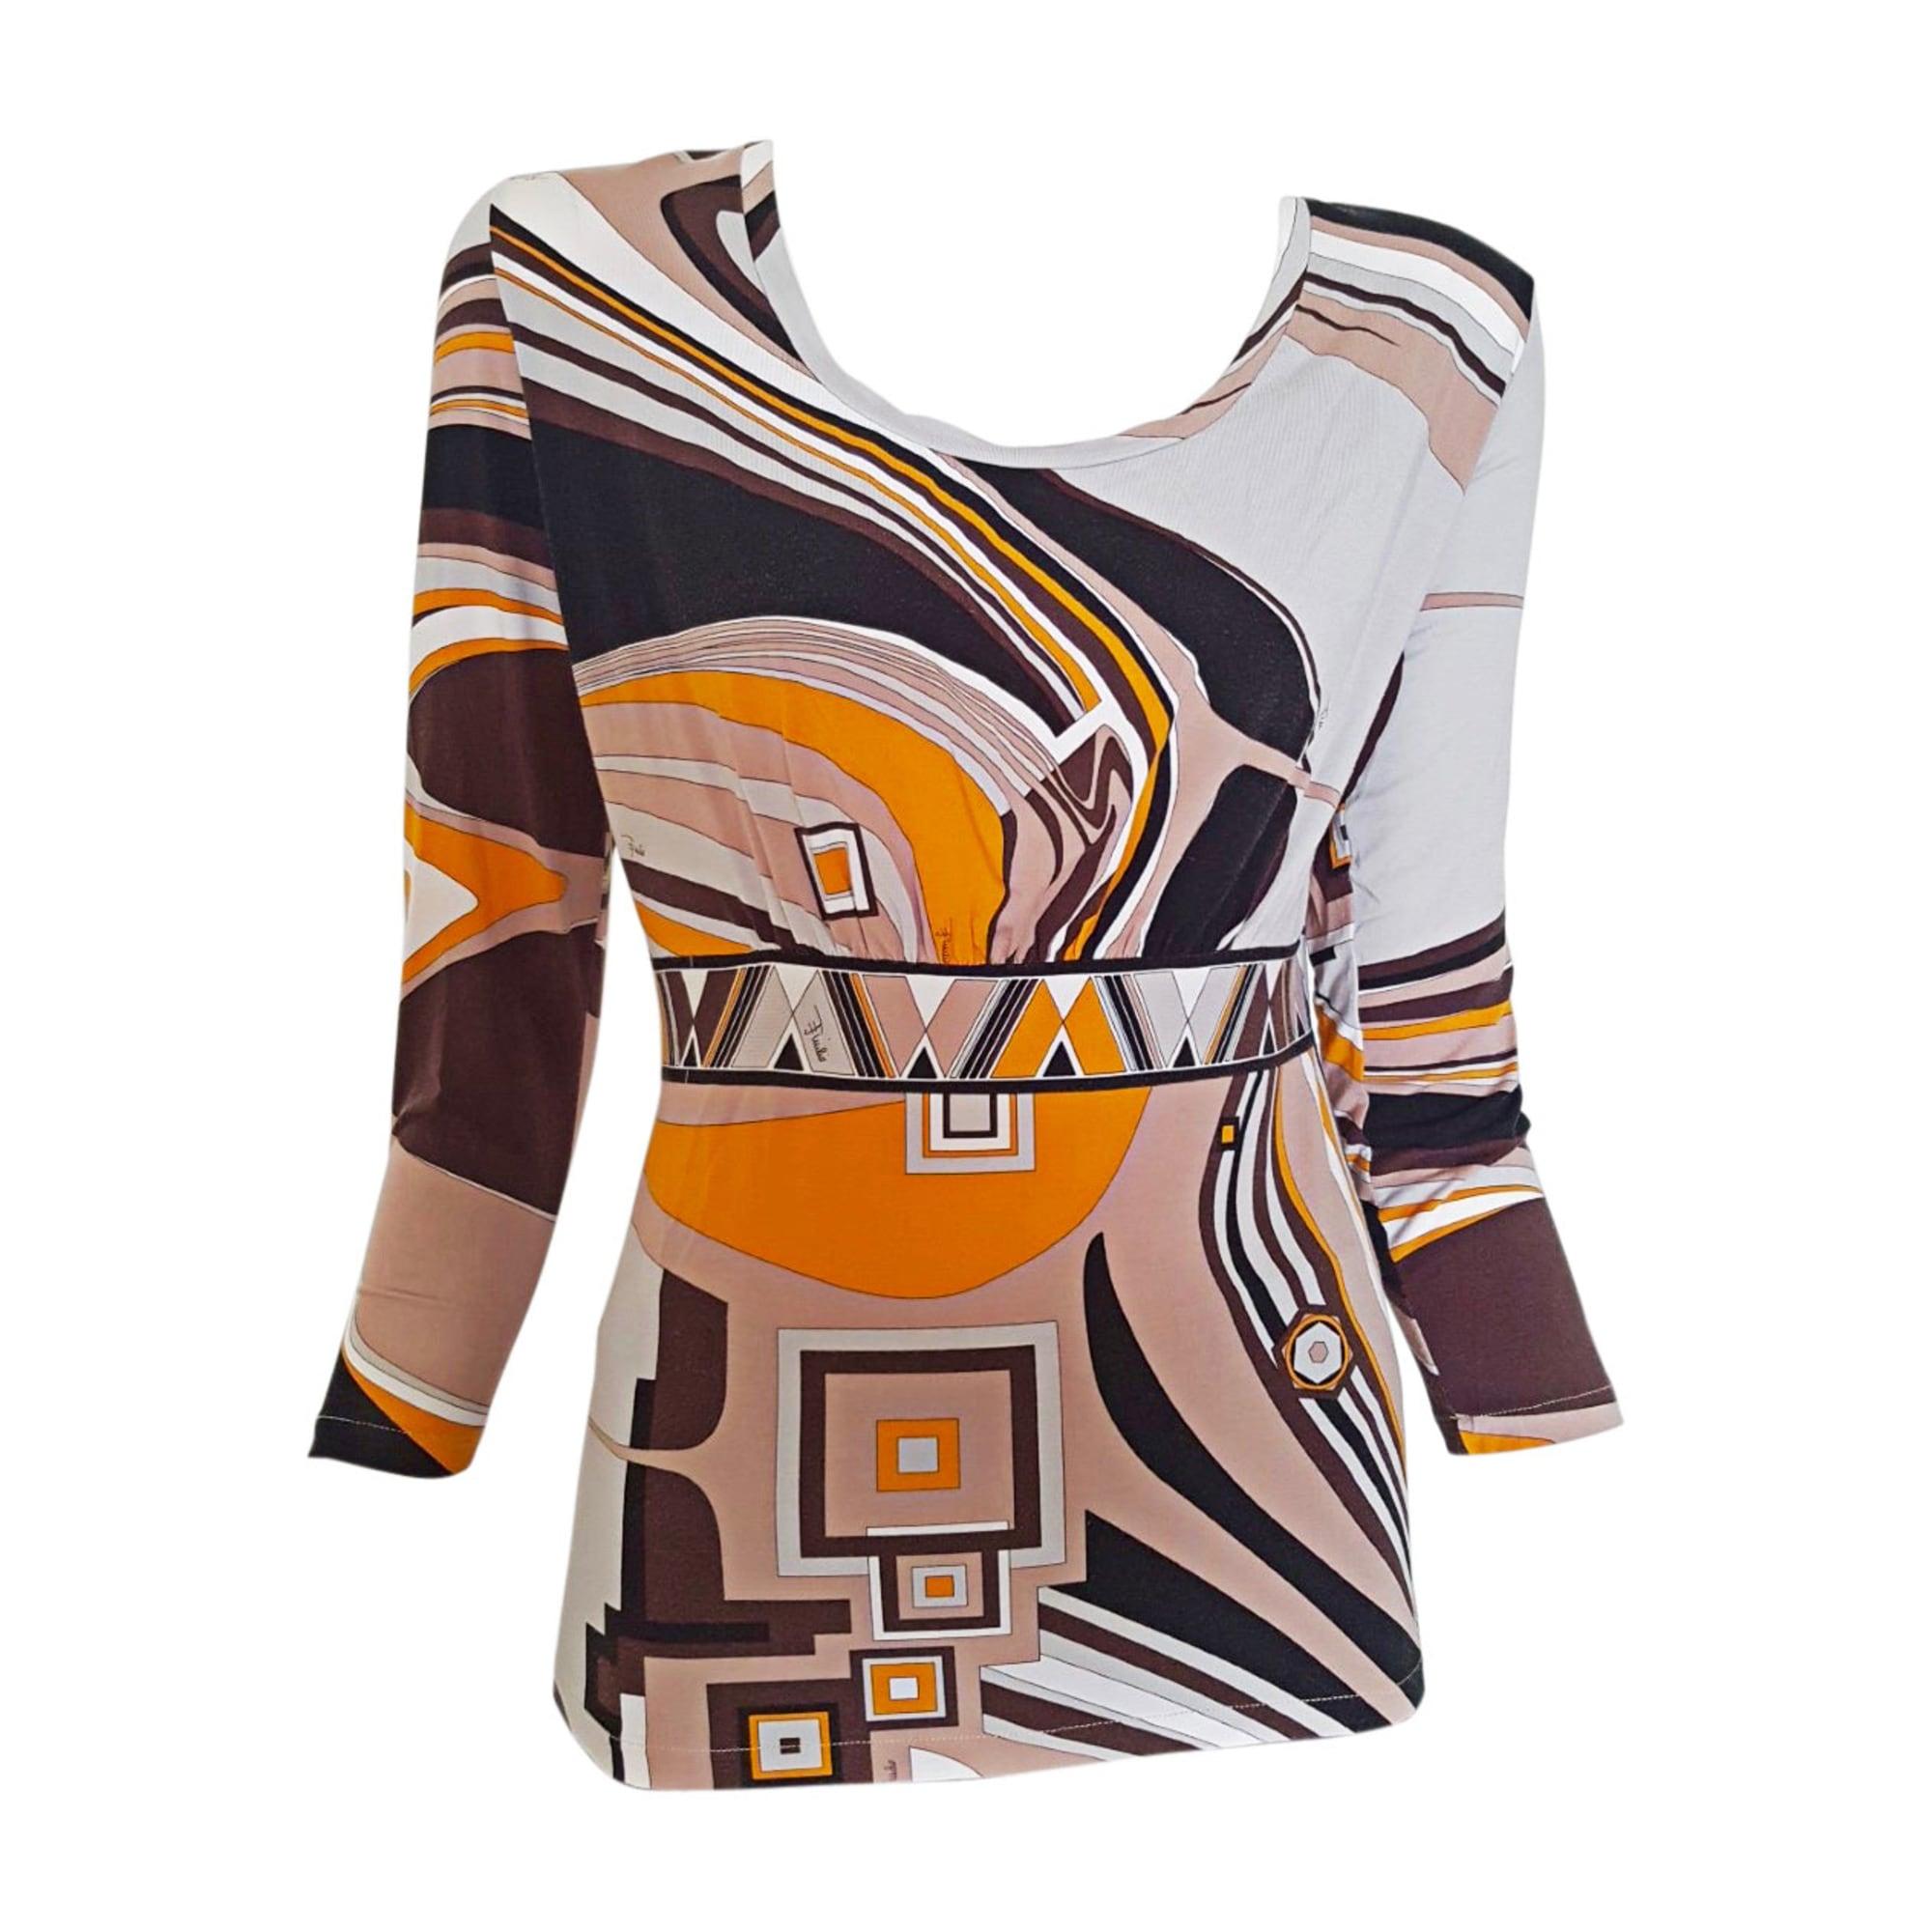 Top, tee-shirt EMILIO PUCCI Orange